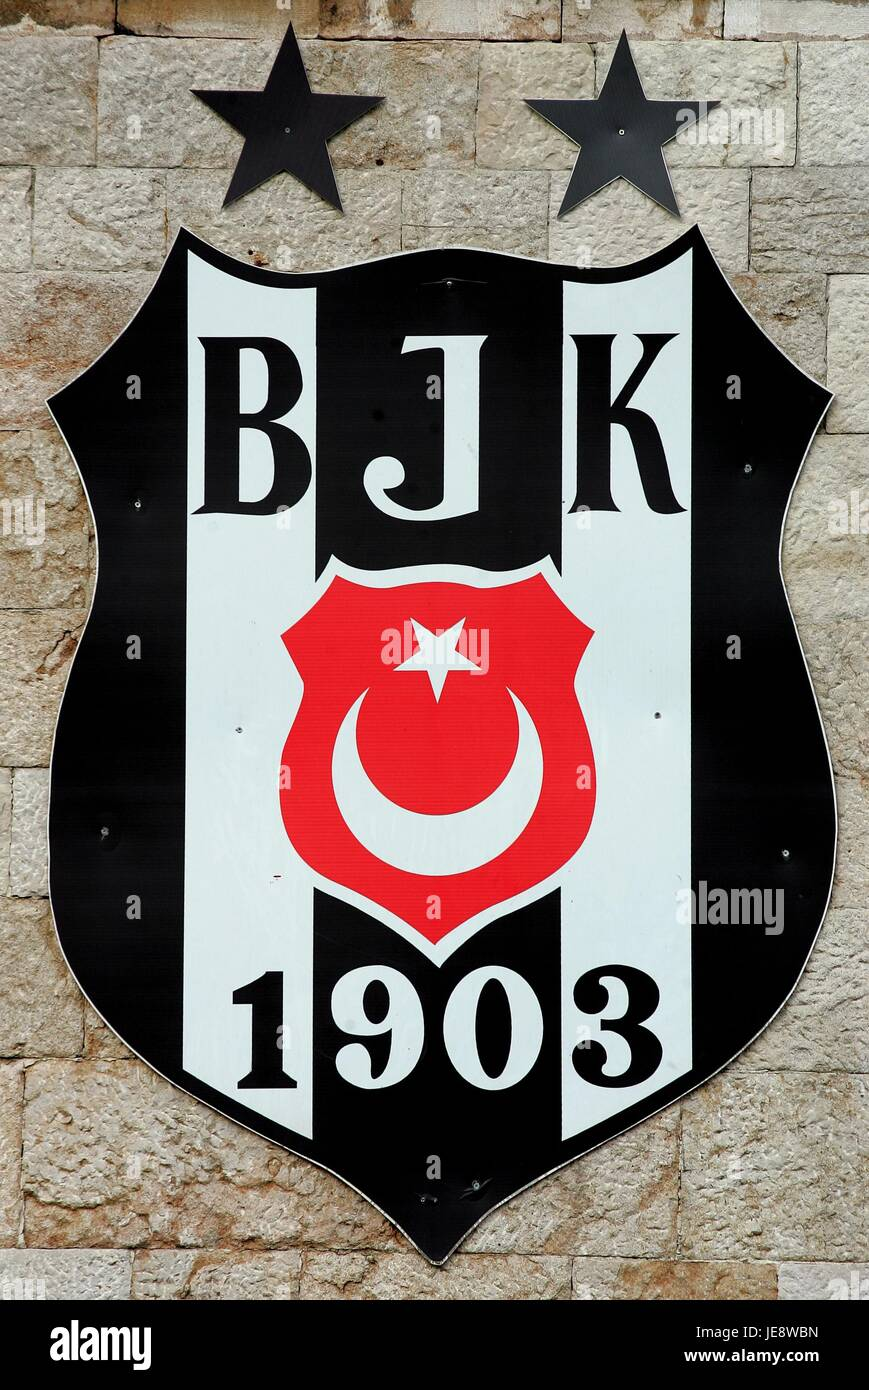 BESIKTAS FOOTBALL CLUB BADGE BESIKTAS ISTANBUL ISTANBUL TURKEY 19 April 2006 - Stock Image